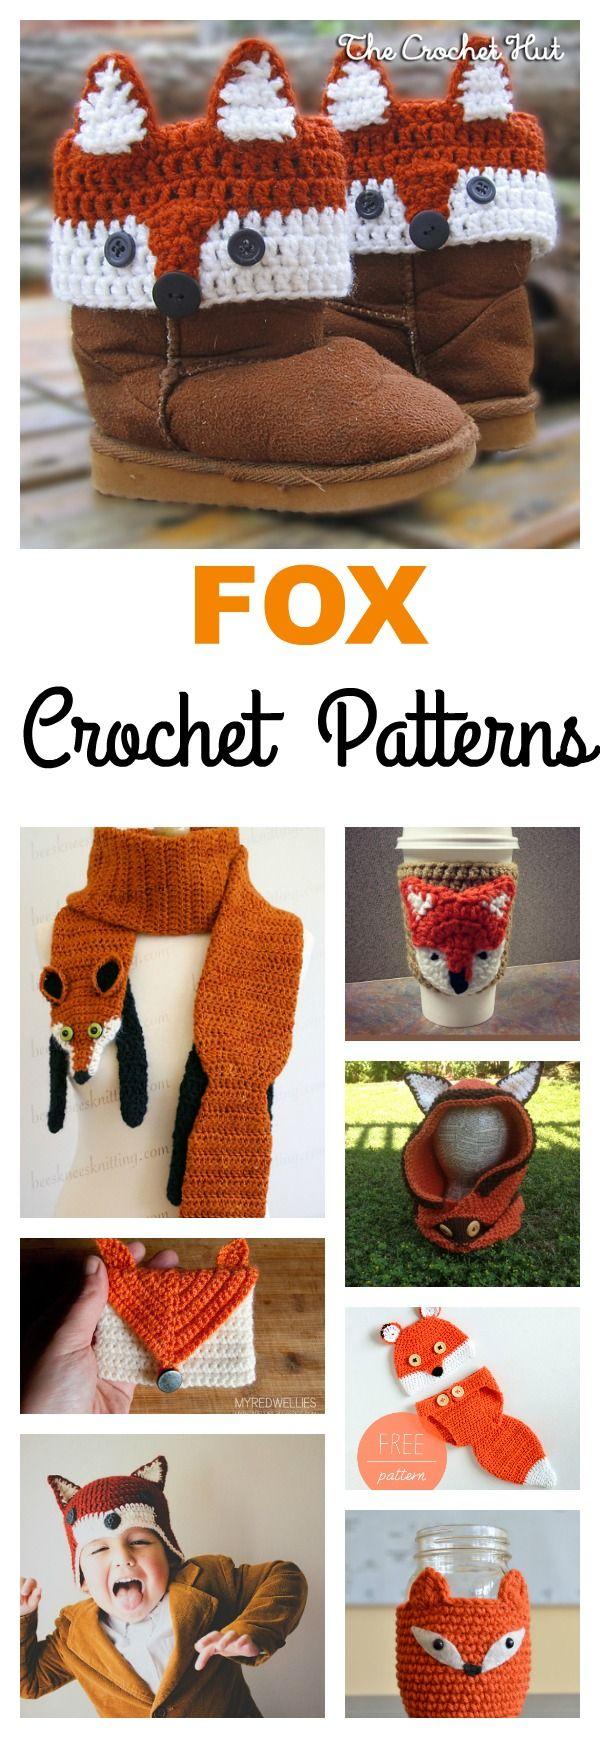 10 Crochet Fox Patterns